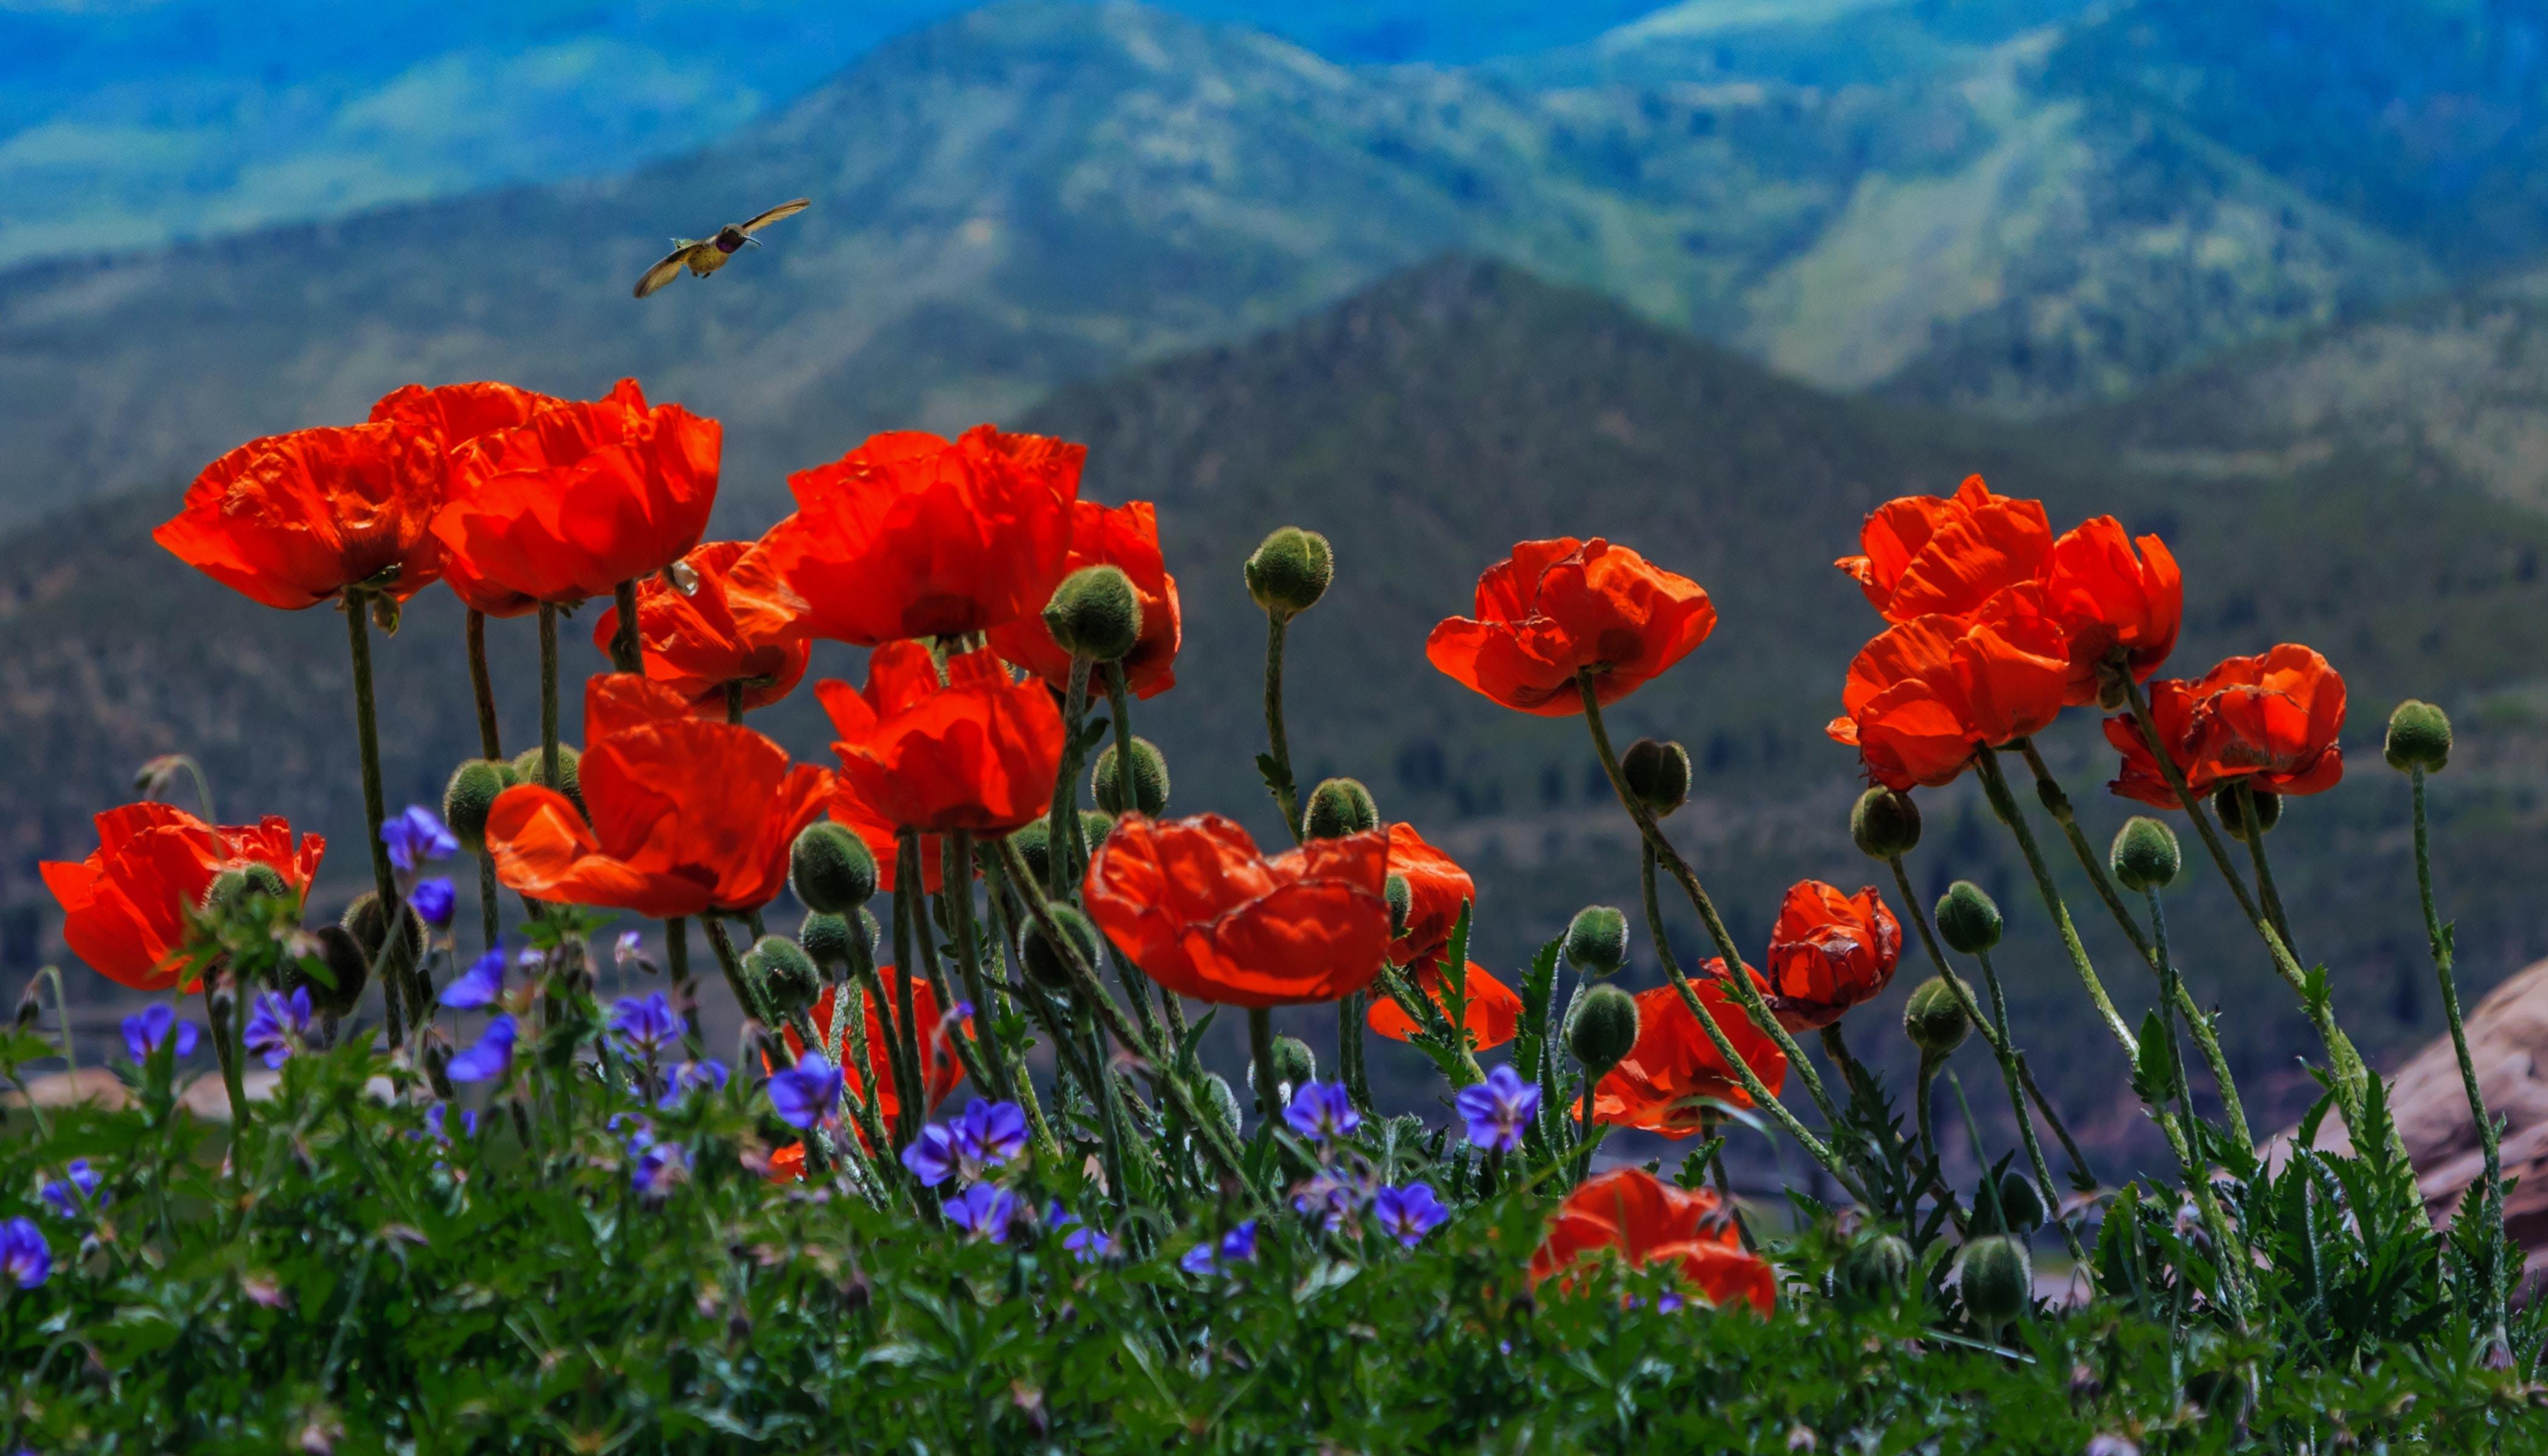 State Flower: California